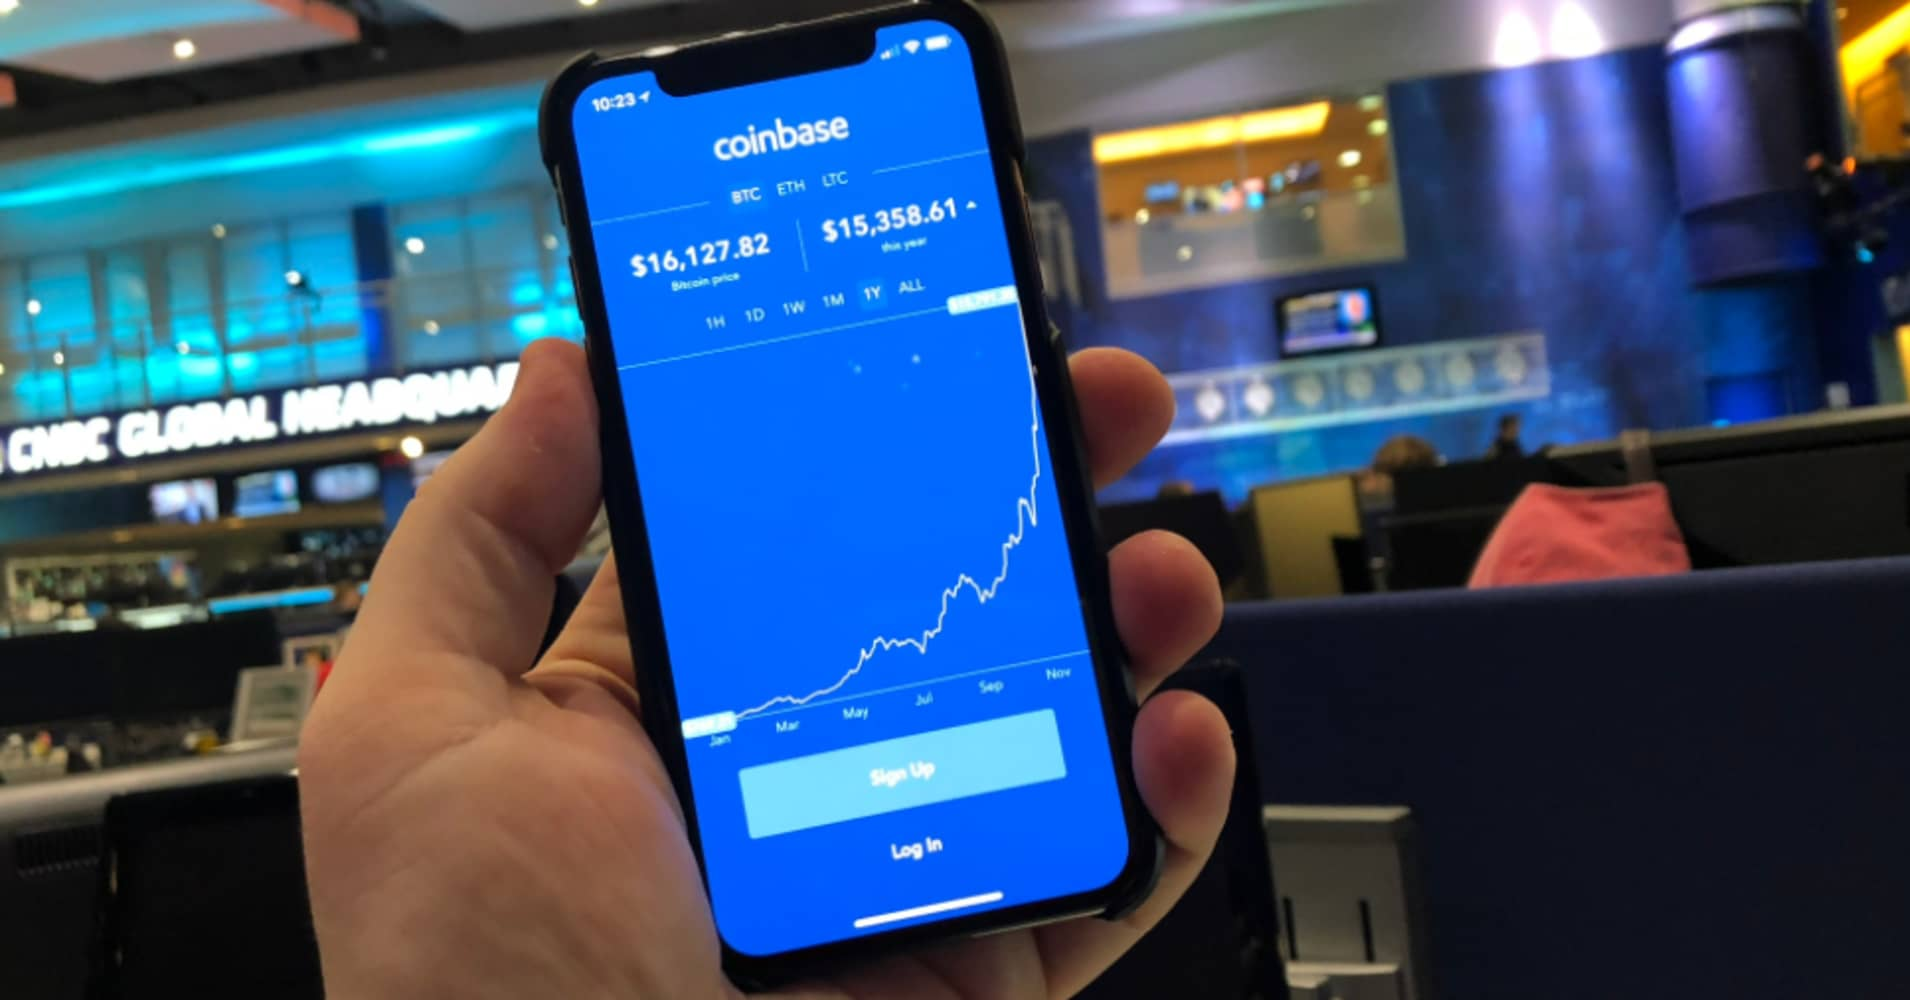 Goldbacke cryptocurrency on coinbase